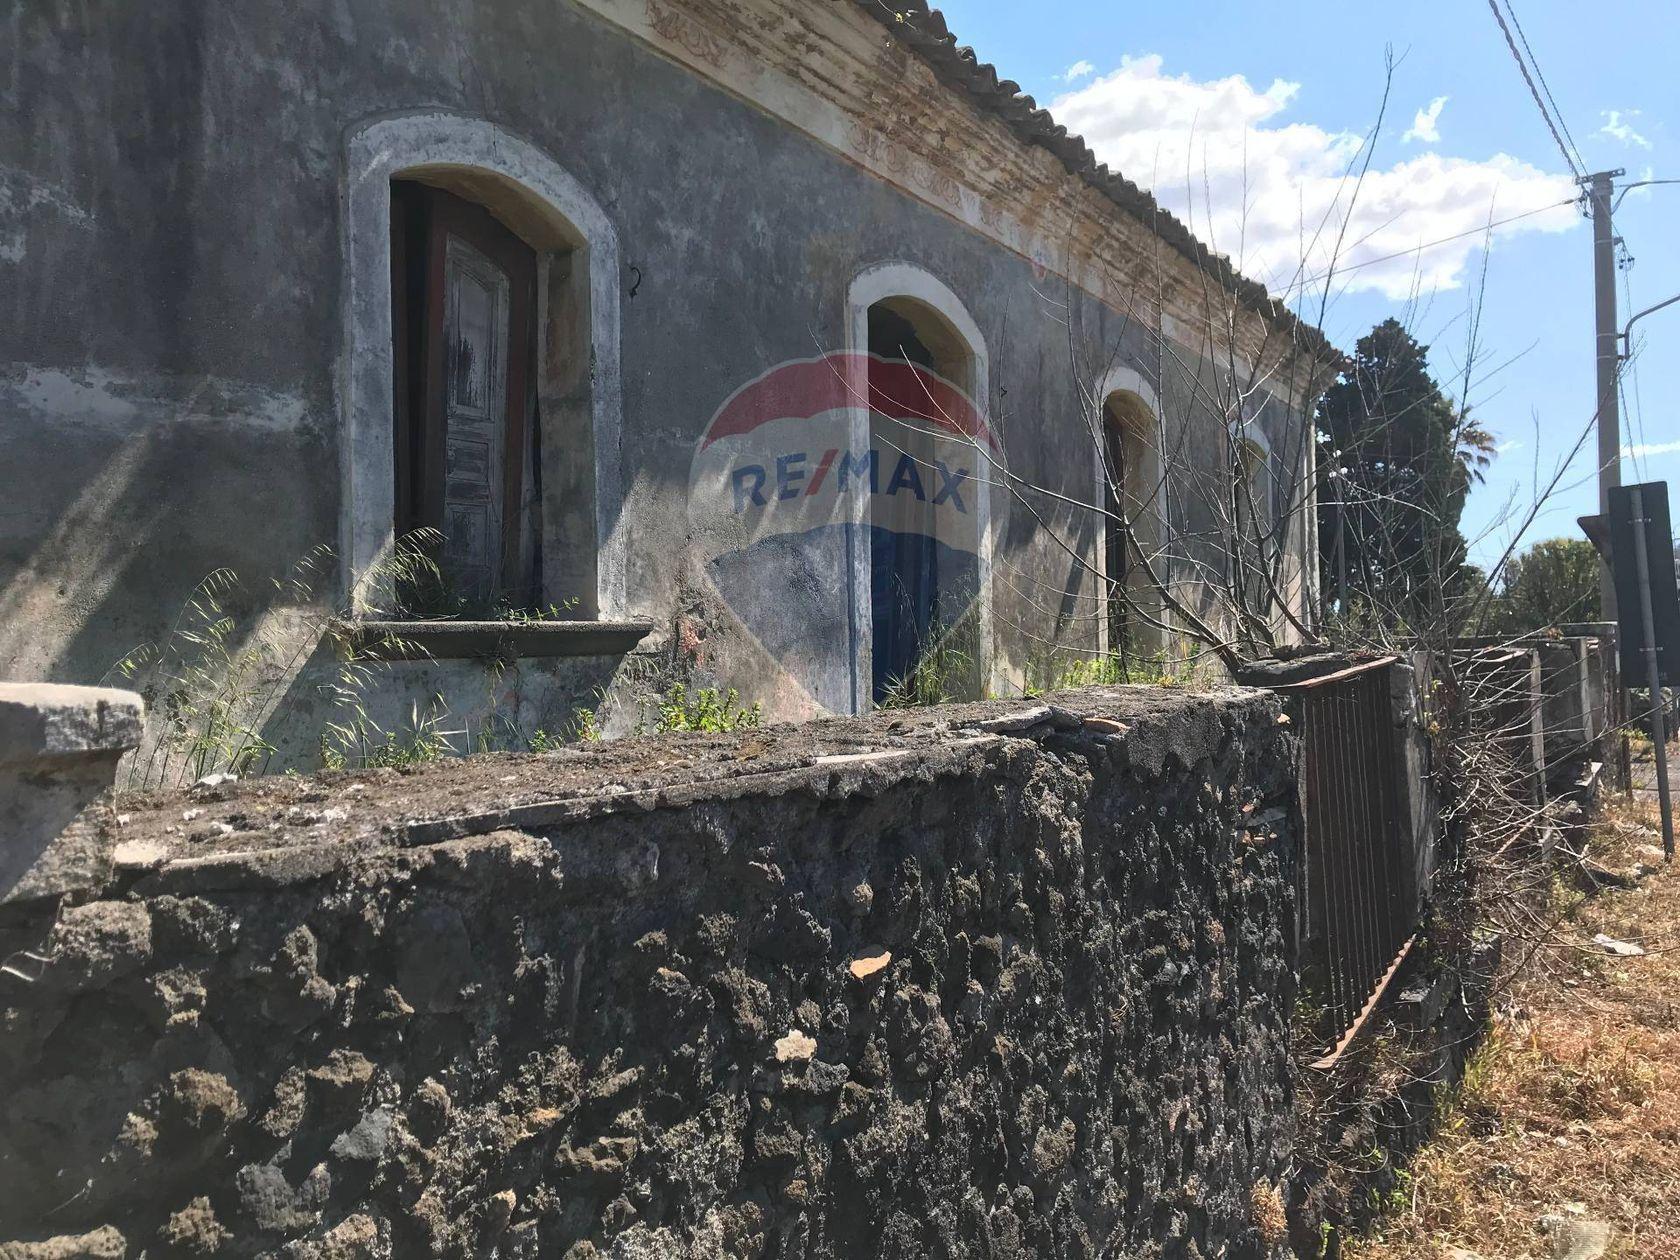 Terreno Piedimonte Etneo, CT Vendita - Foto 11